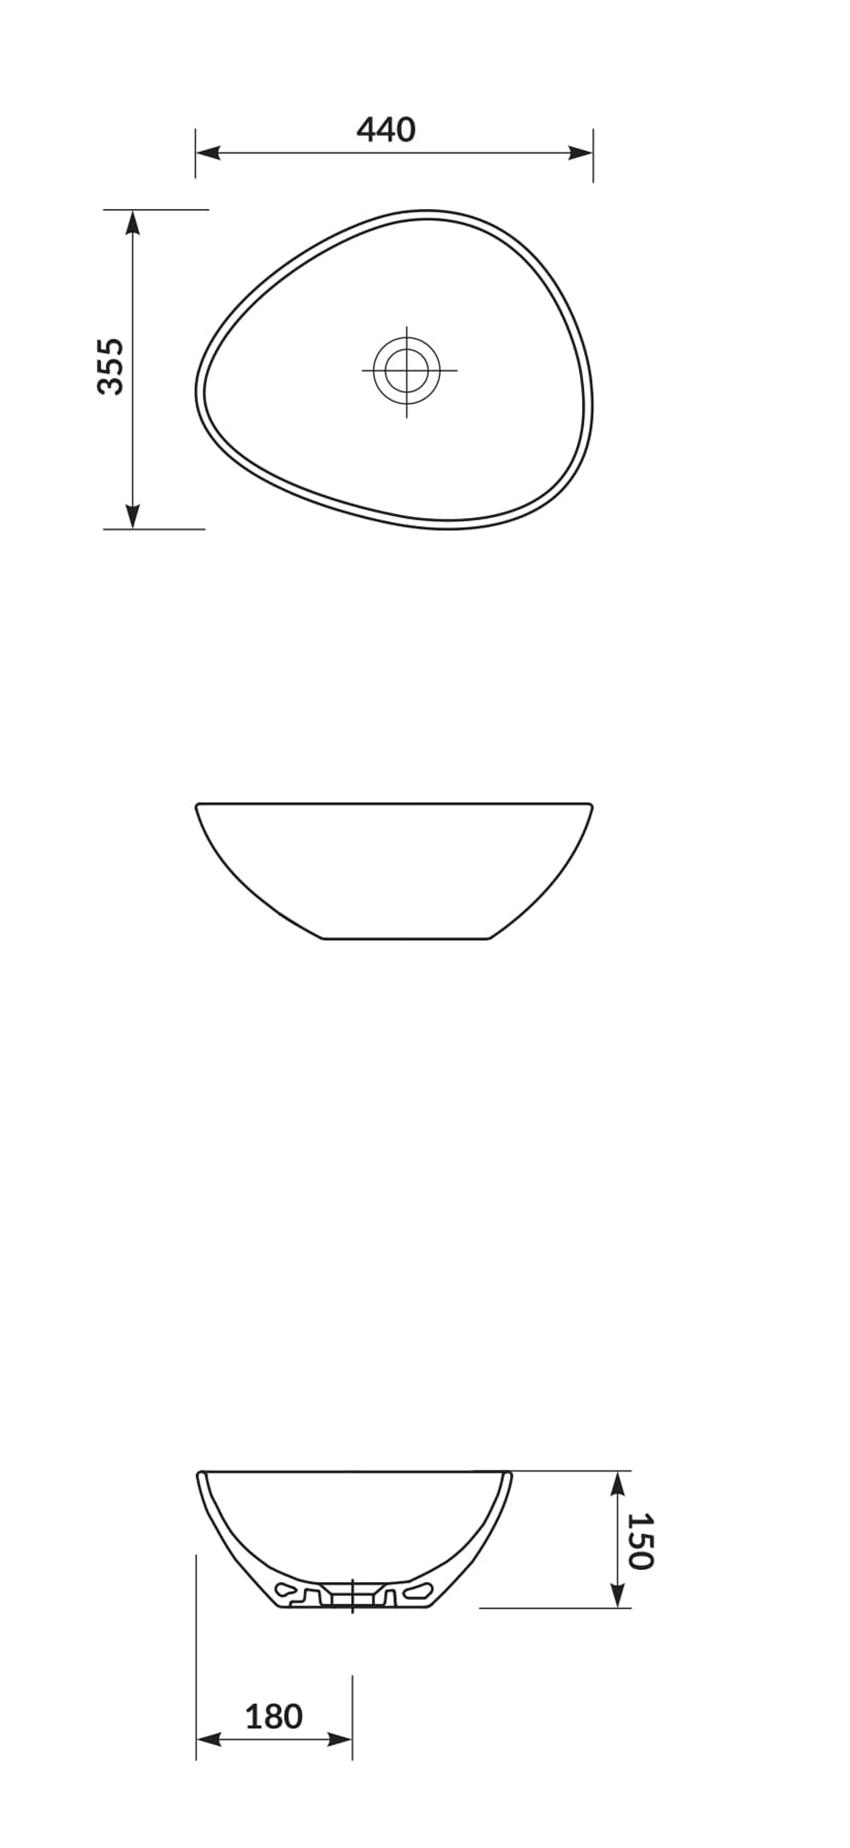 Umywalka nablatowa 40 cm Cersanit Moduo rysunek